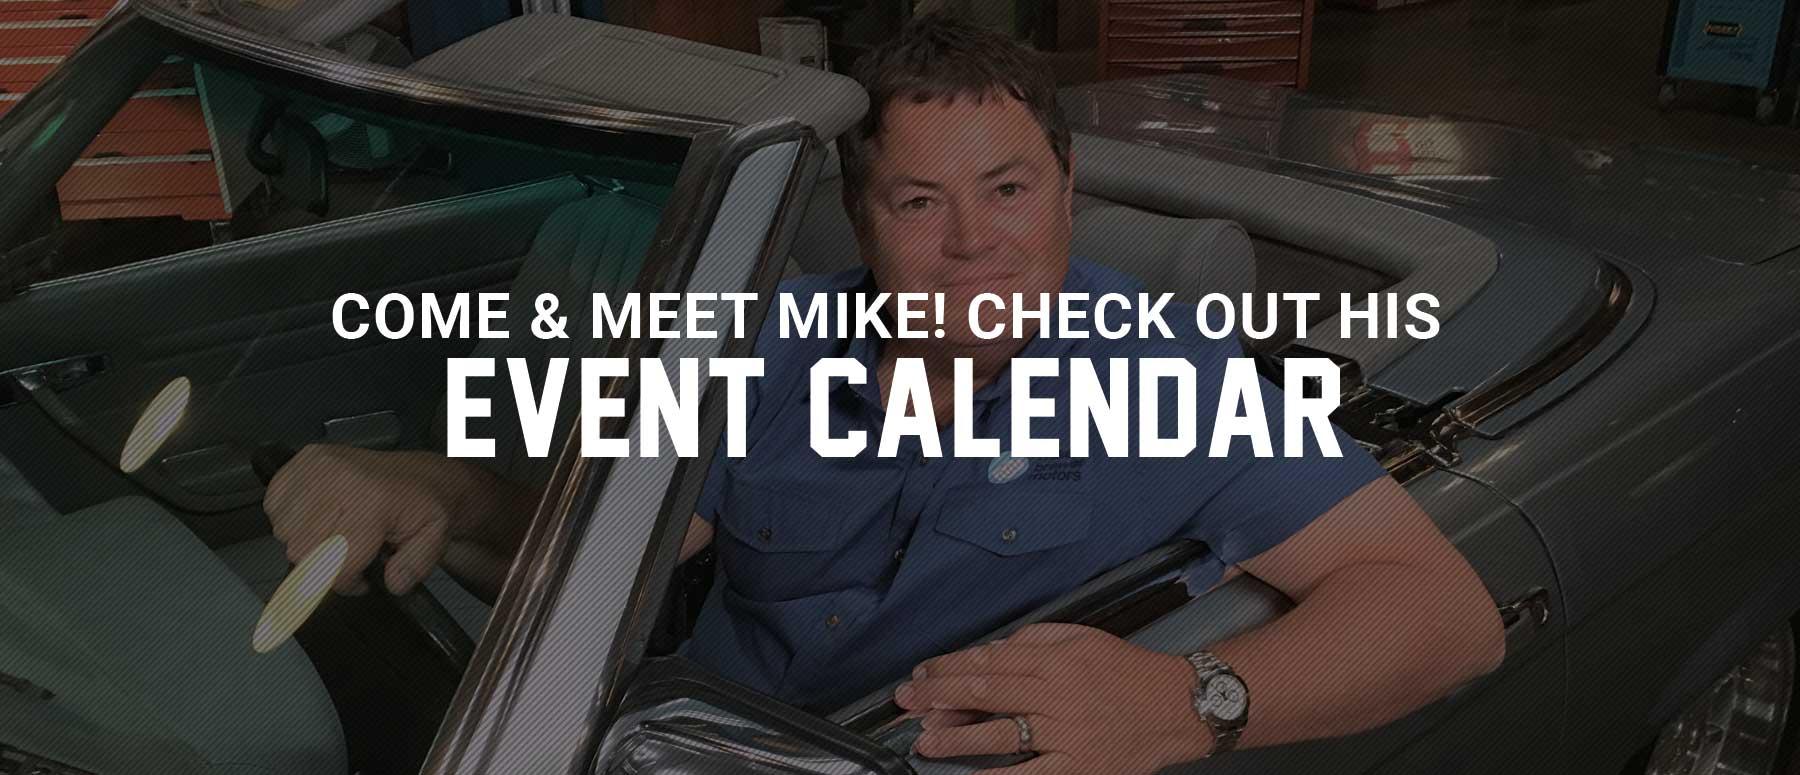 Mikes Event Calendar